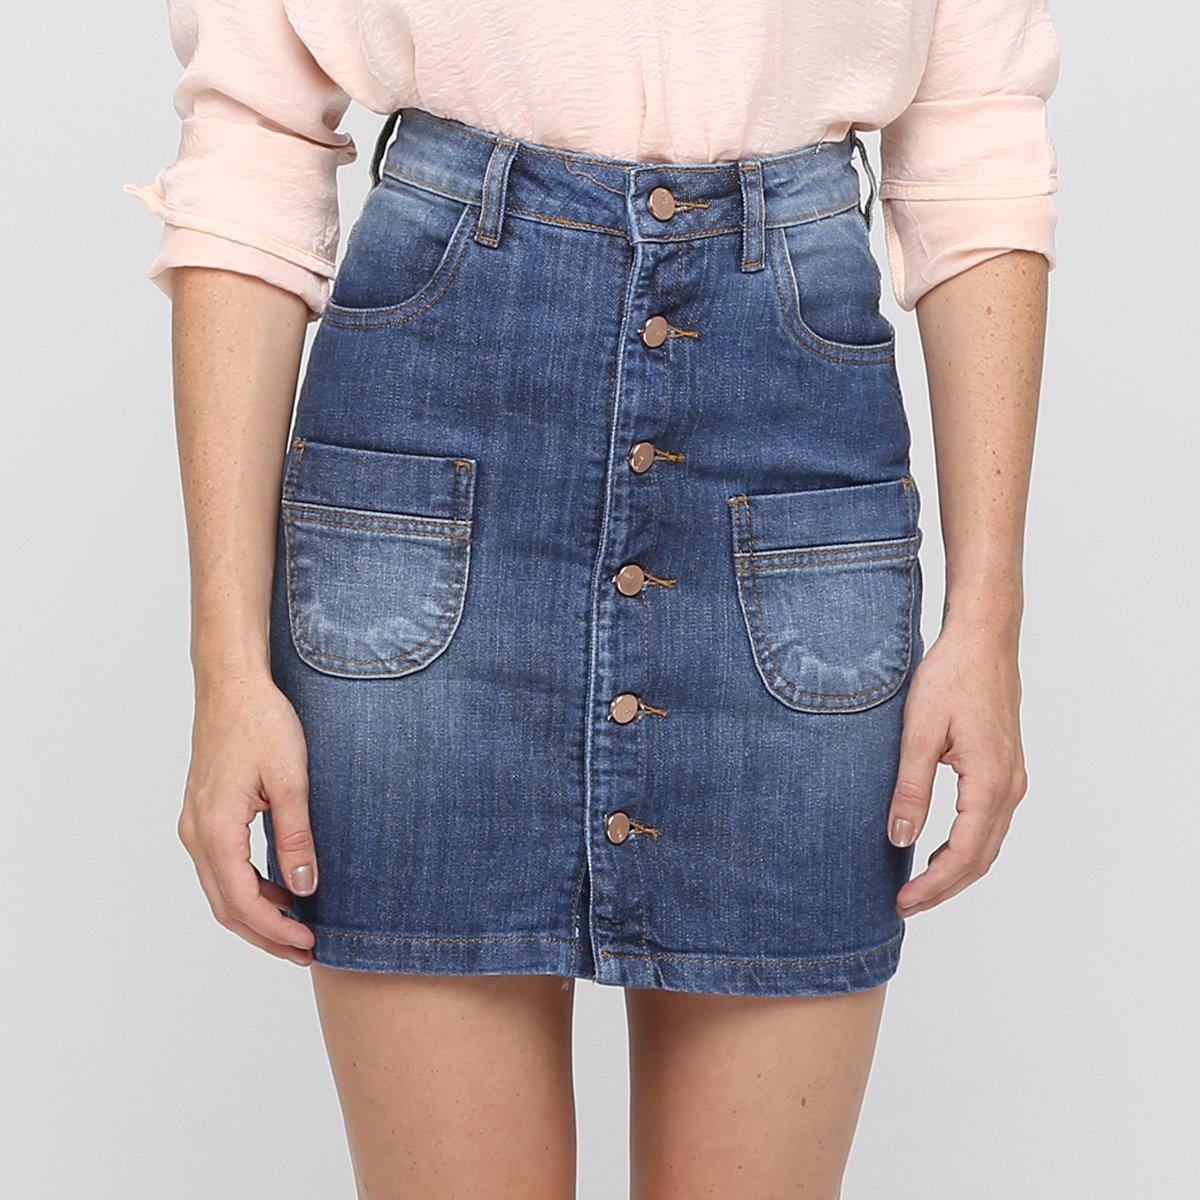 Top Saia Jeans Zune Cintura Alta Botões - Jeans VI83